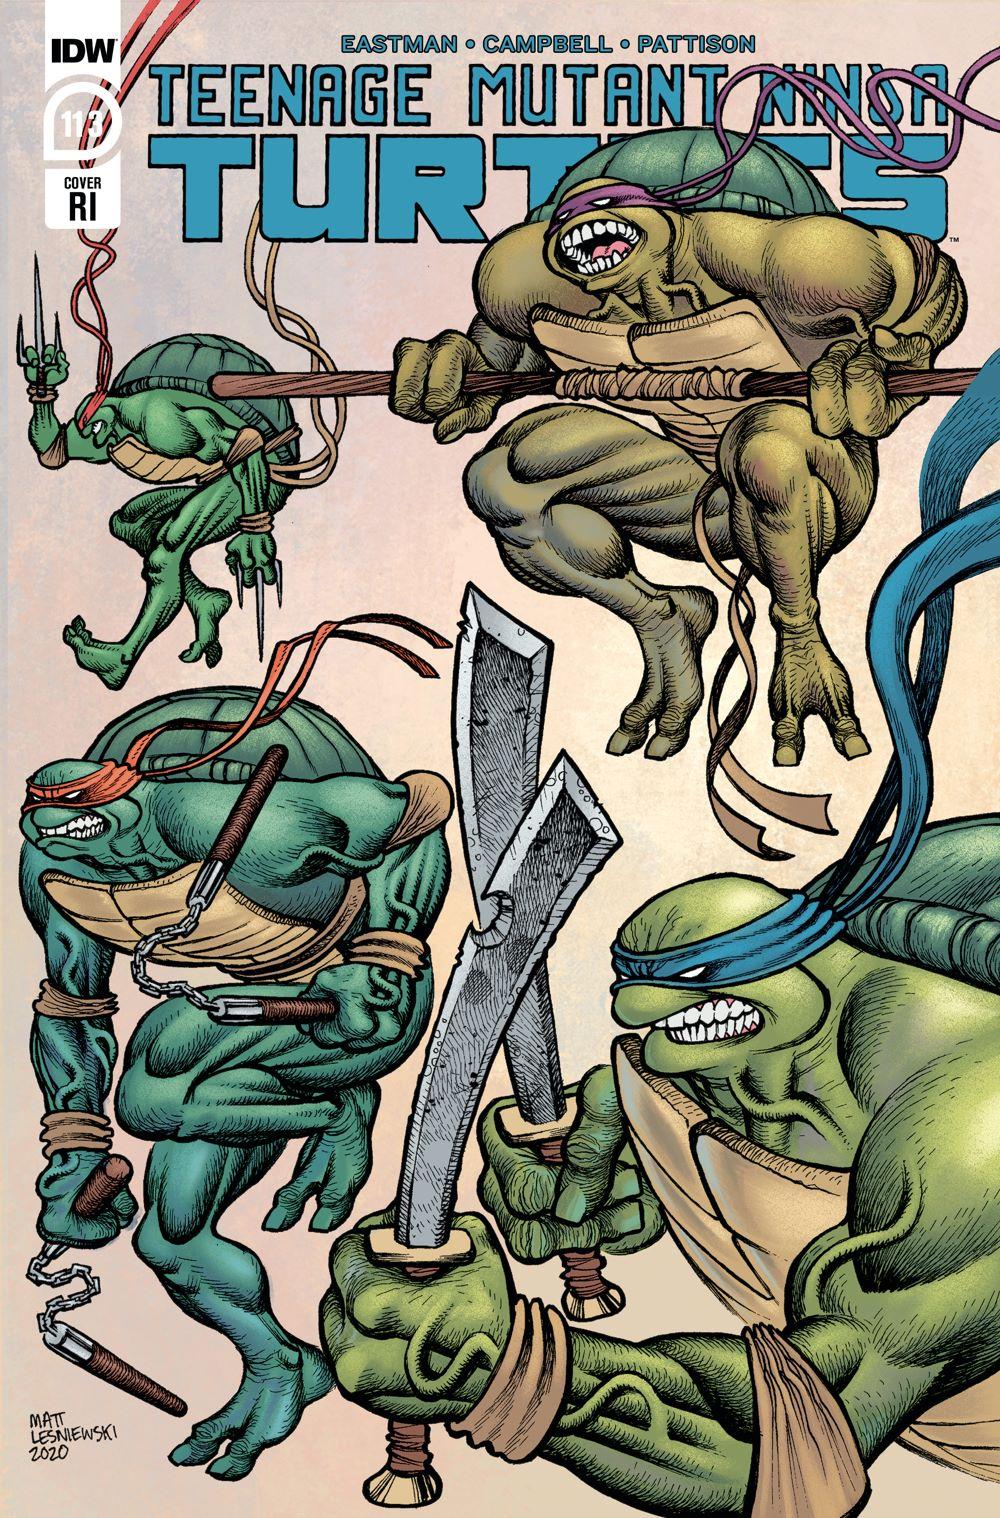 TMNT113_cvrRI ComicList: IDW Publishing New Releases for 01/20/2021